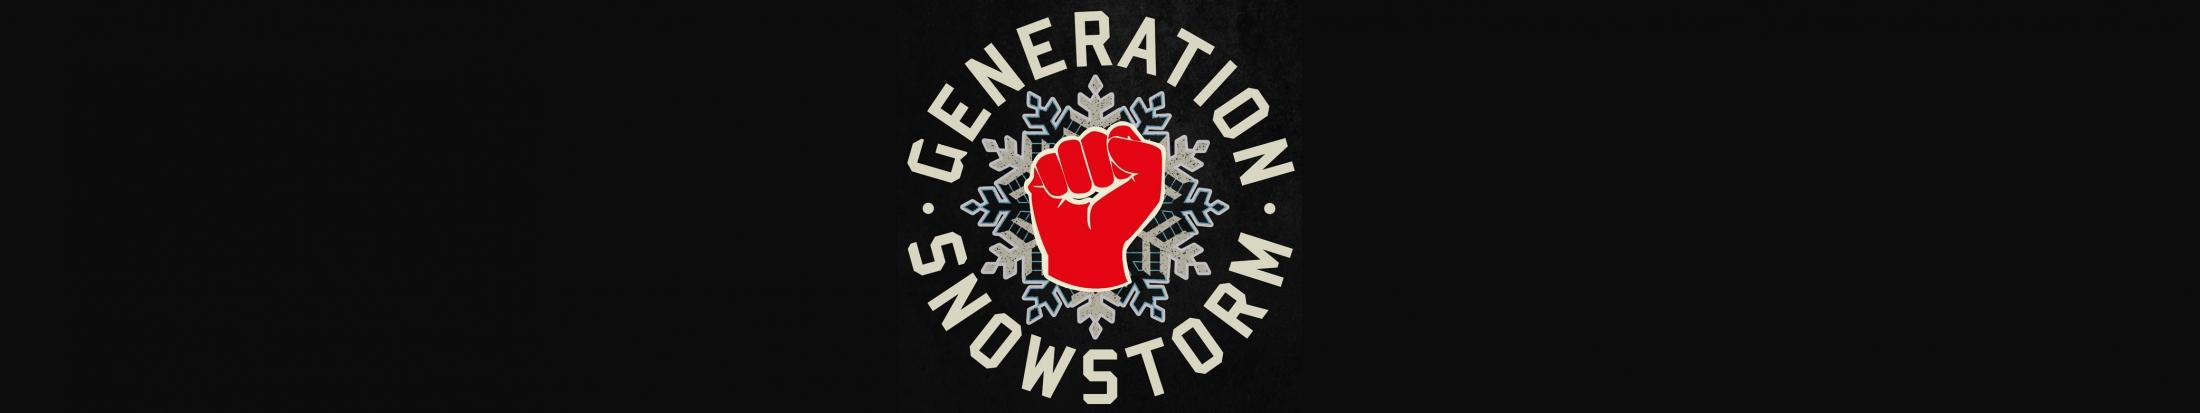 Generation Snowstorm